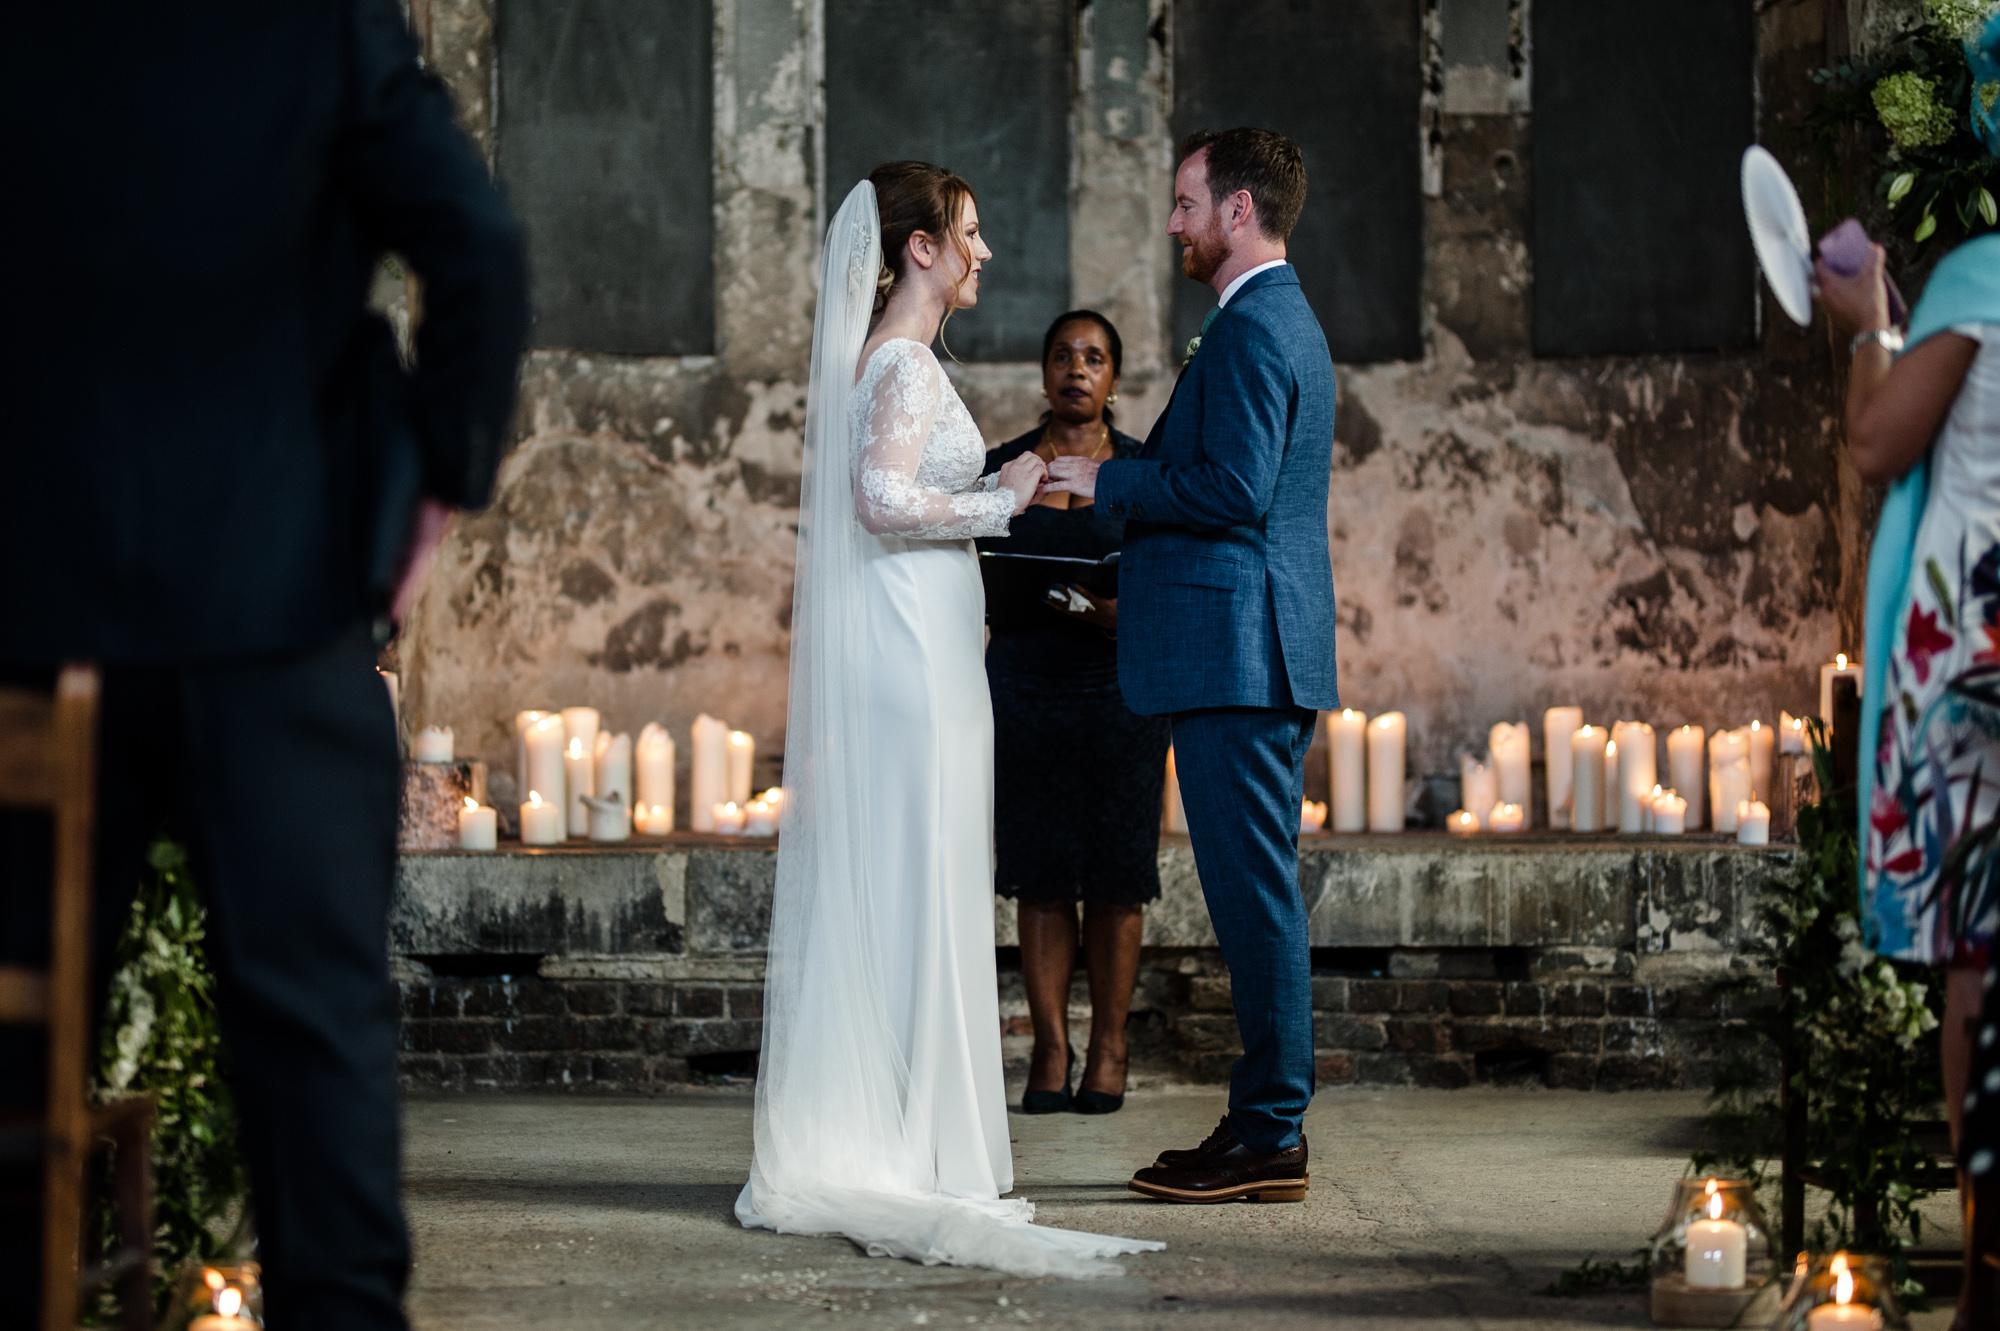 London Wedding photography 04.10.18 24.jpg